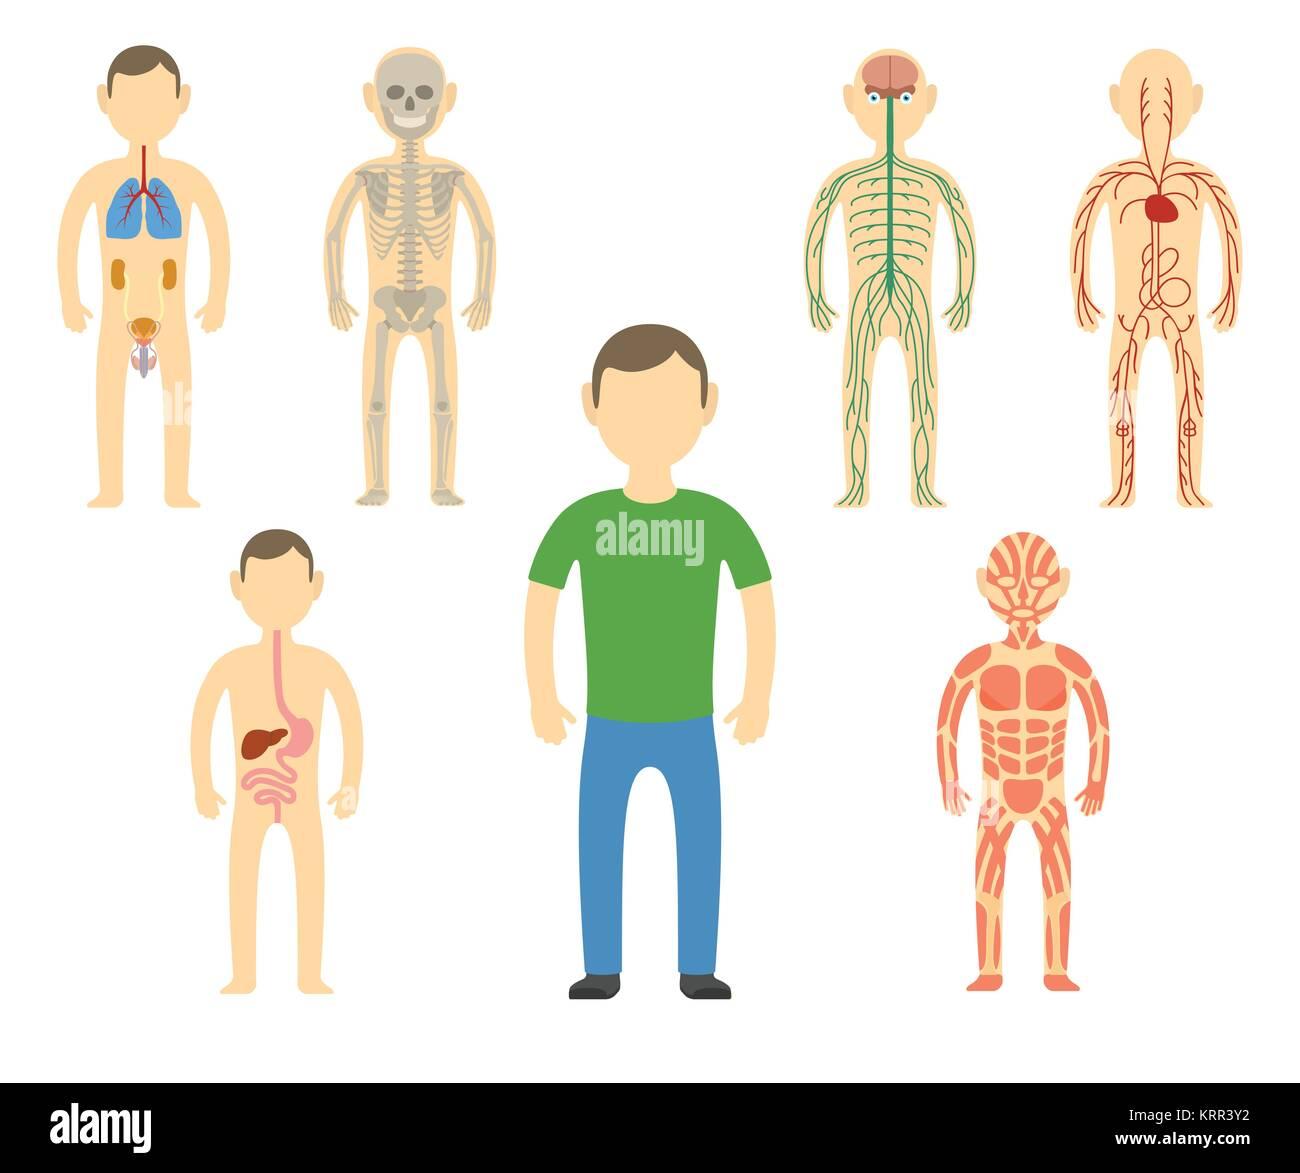 Cartoon man body anatomy. All body systems - Urogenital, Respiratory, Nervous, Circulatory, Skeleton, Digestive - Stock Image